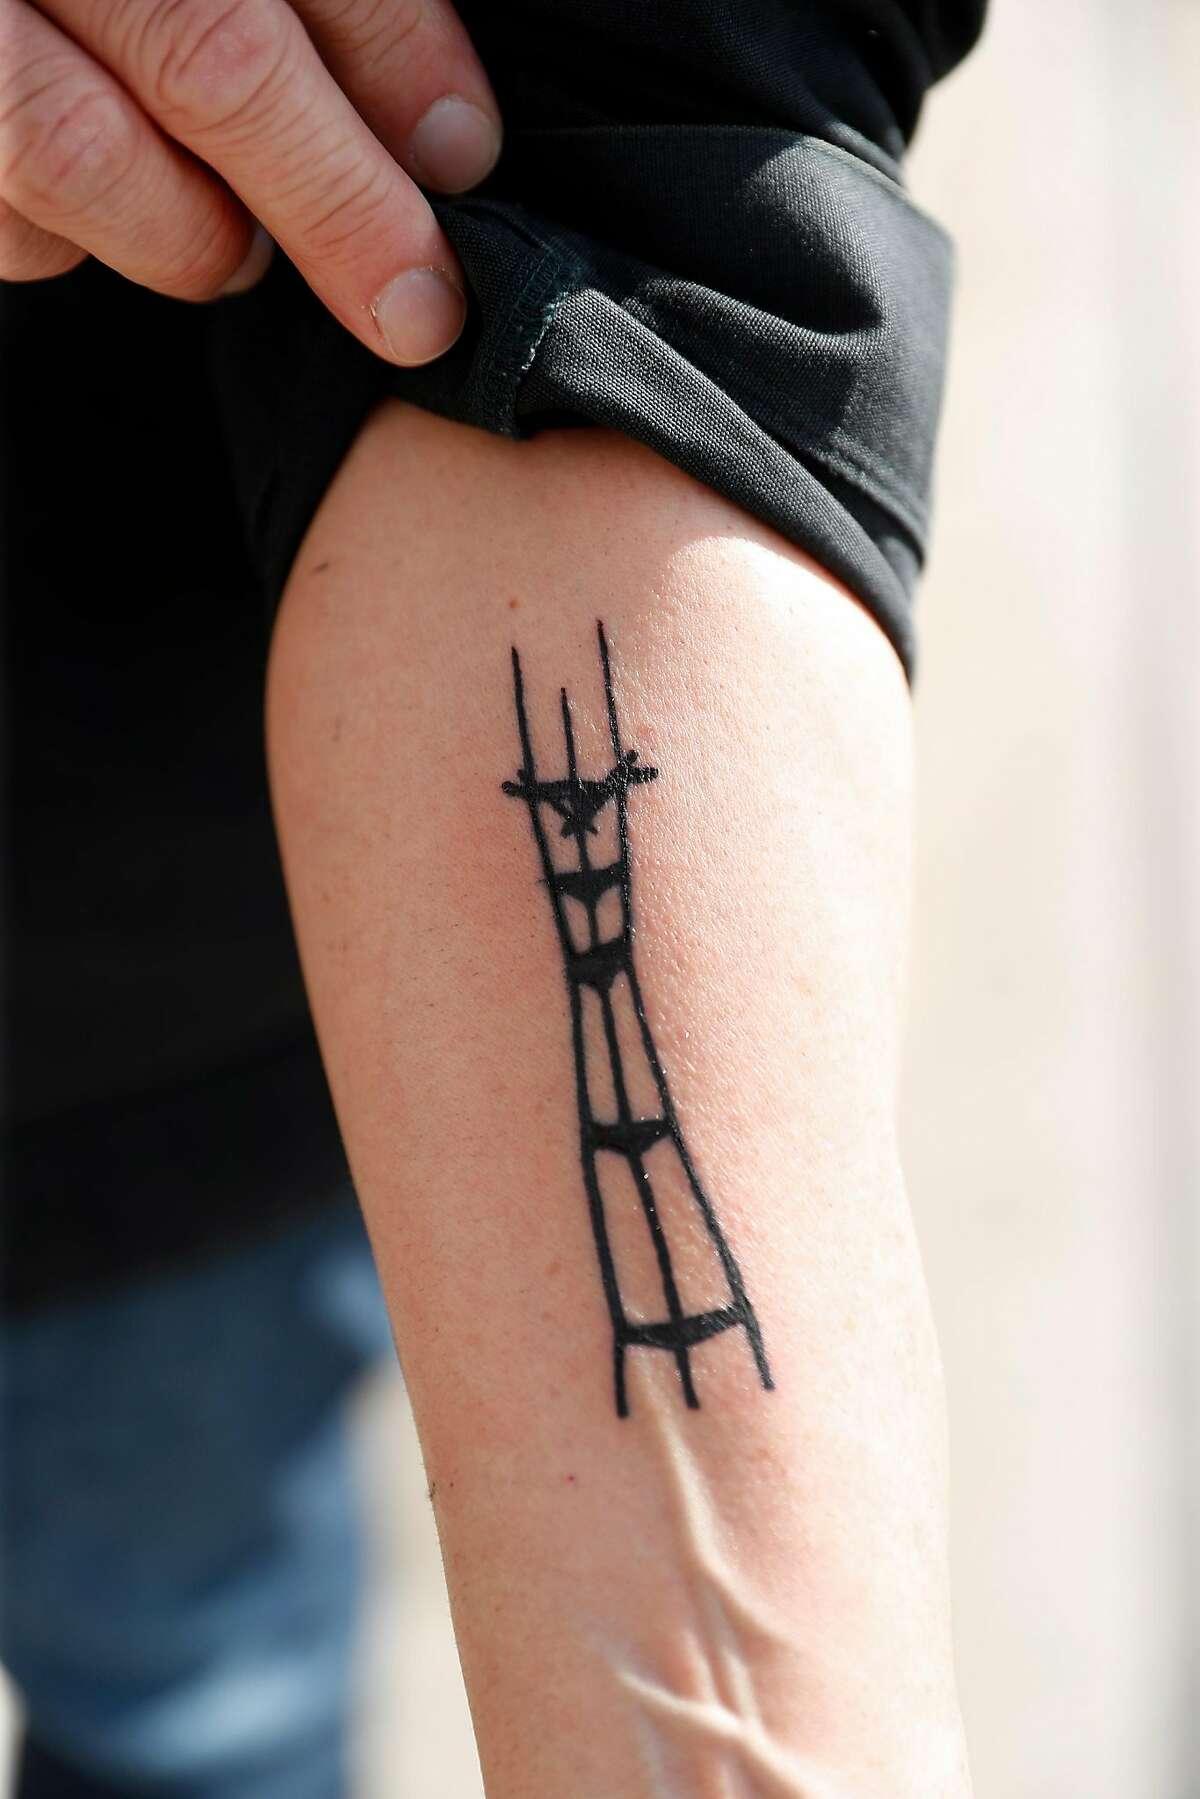 Alabama history professor Gordon Harvey shows his Sutro Tower tattoo while touring City Hall in San Francisco, Calif., on Thursday, February 20, 2020.